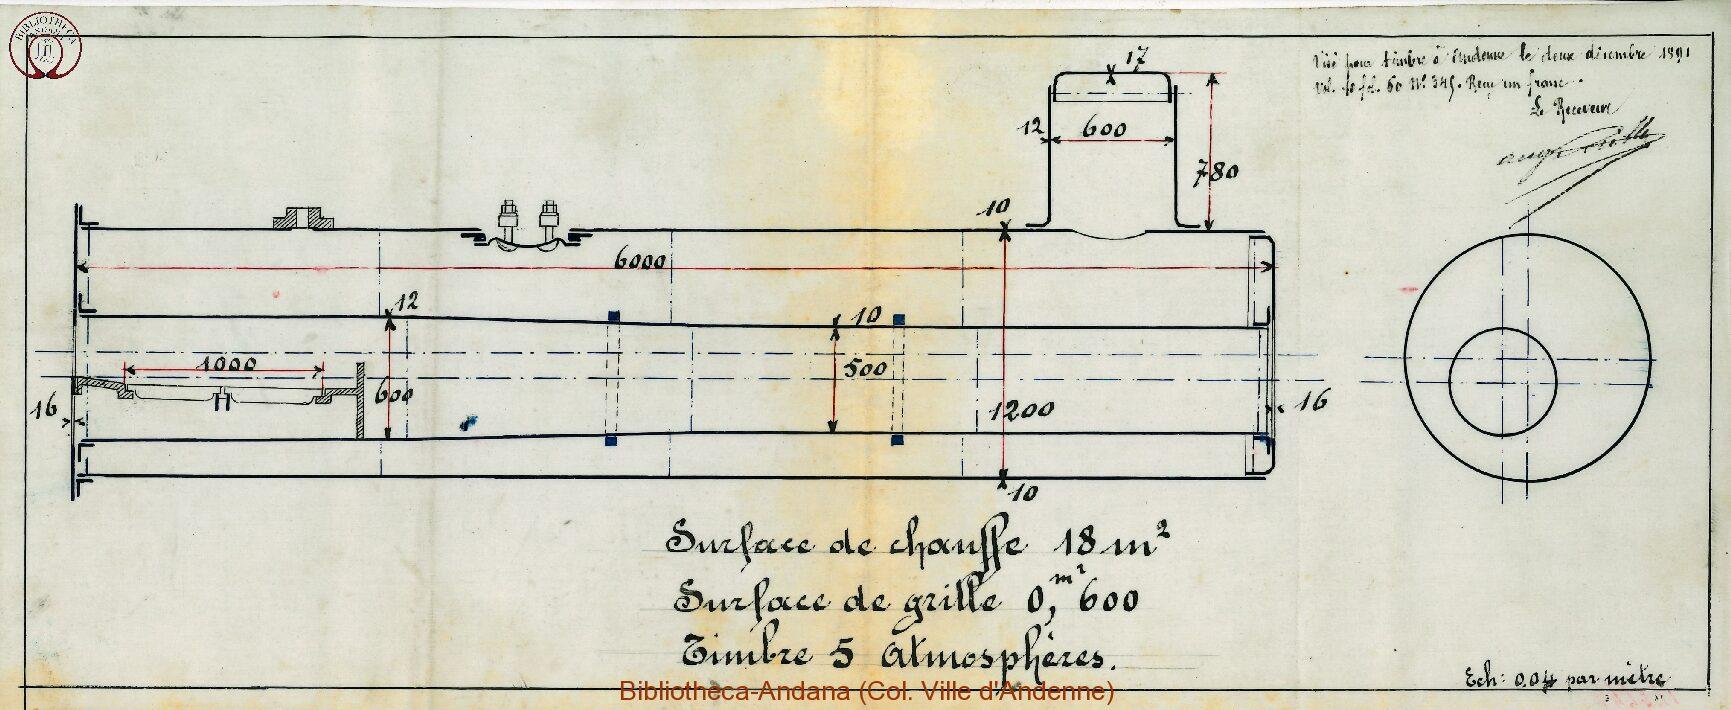 1891-12-02